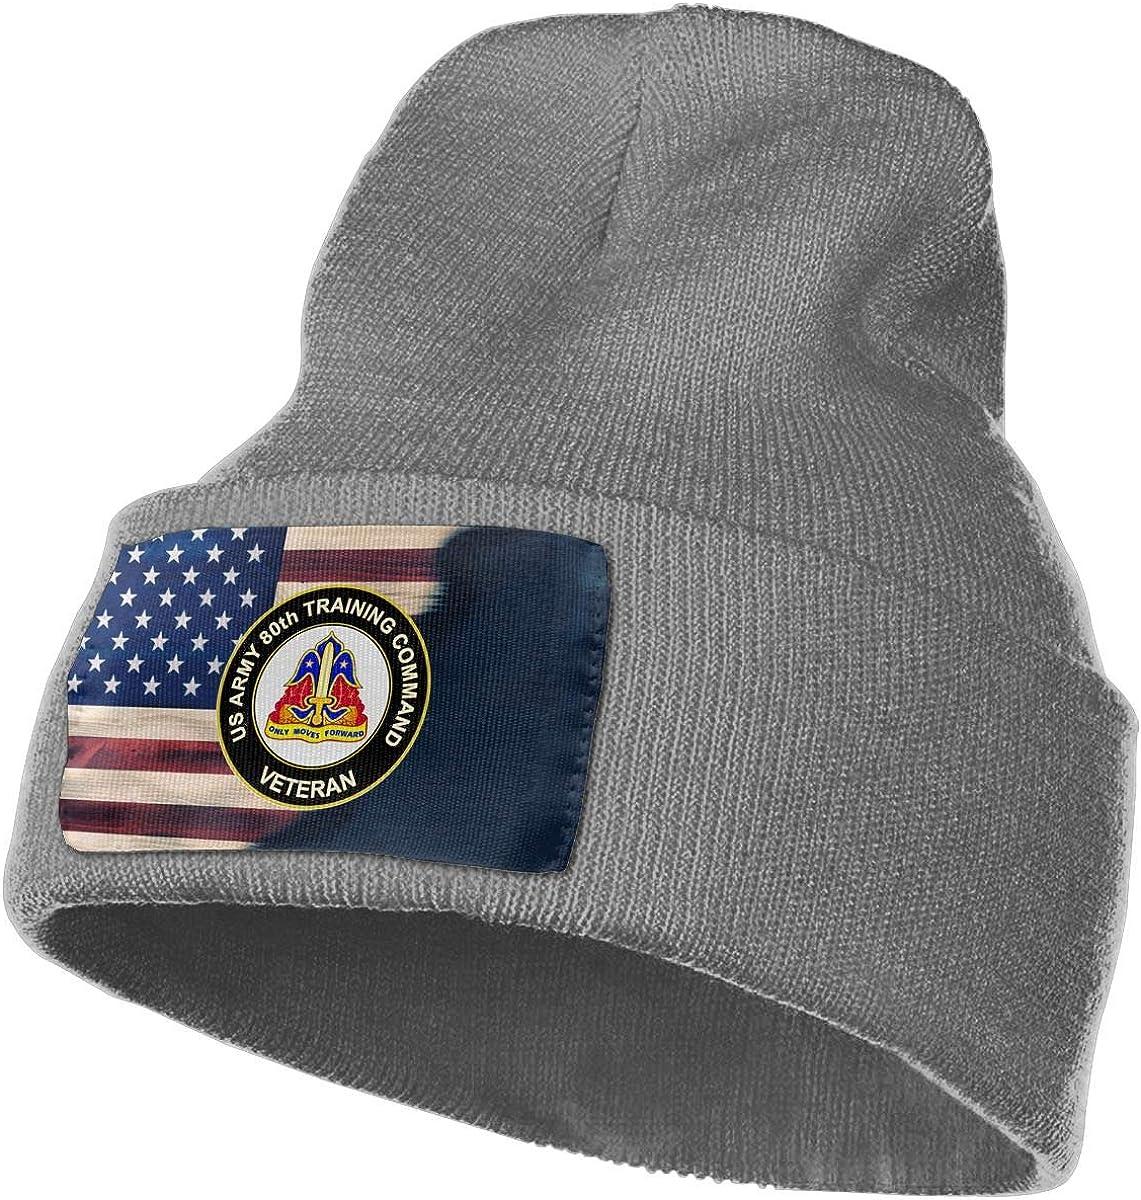 US Army 80th Training Command Veteran Mens Beanie Cap Skull Cap Winter Warm Knitting Hats.